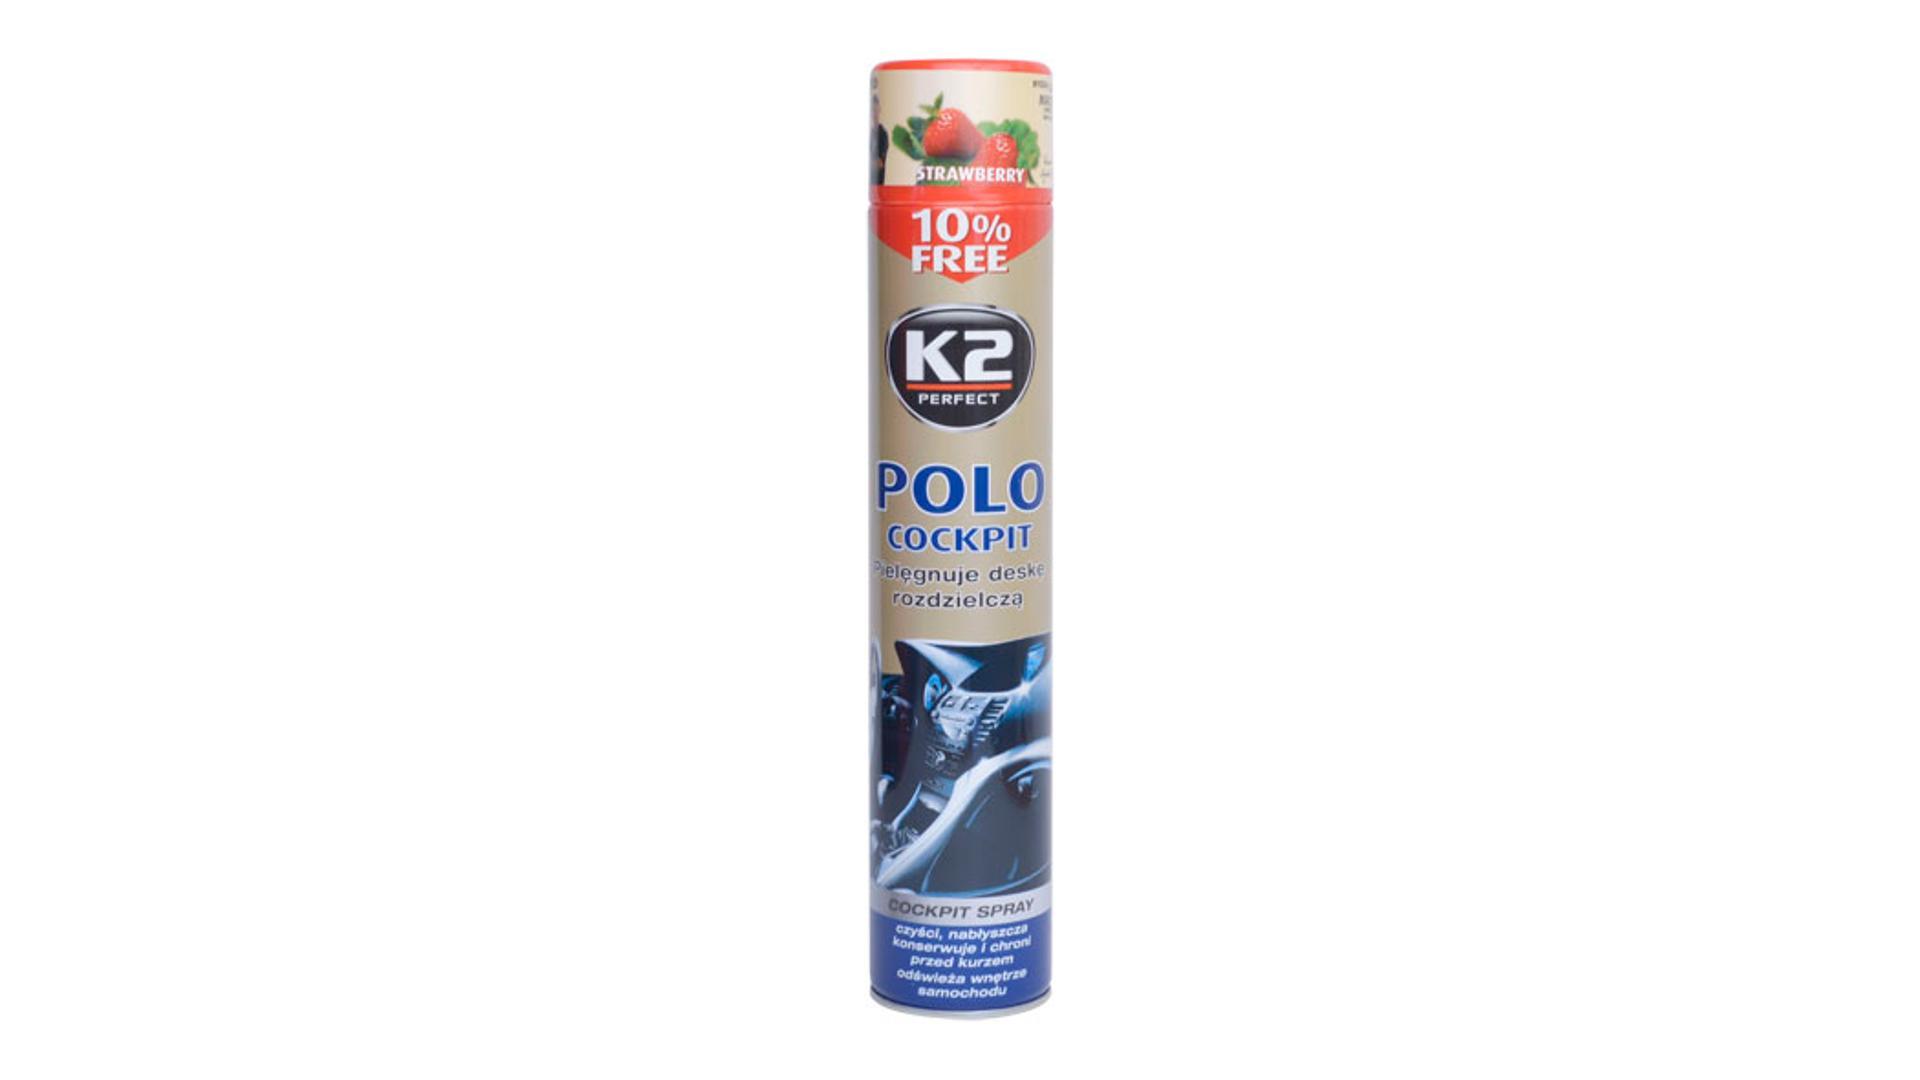 K2 POLO COCKPIT 750ml STRAWBERRY - ochrana vnitřních plastů